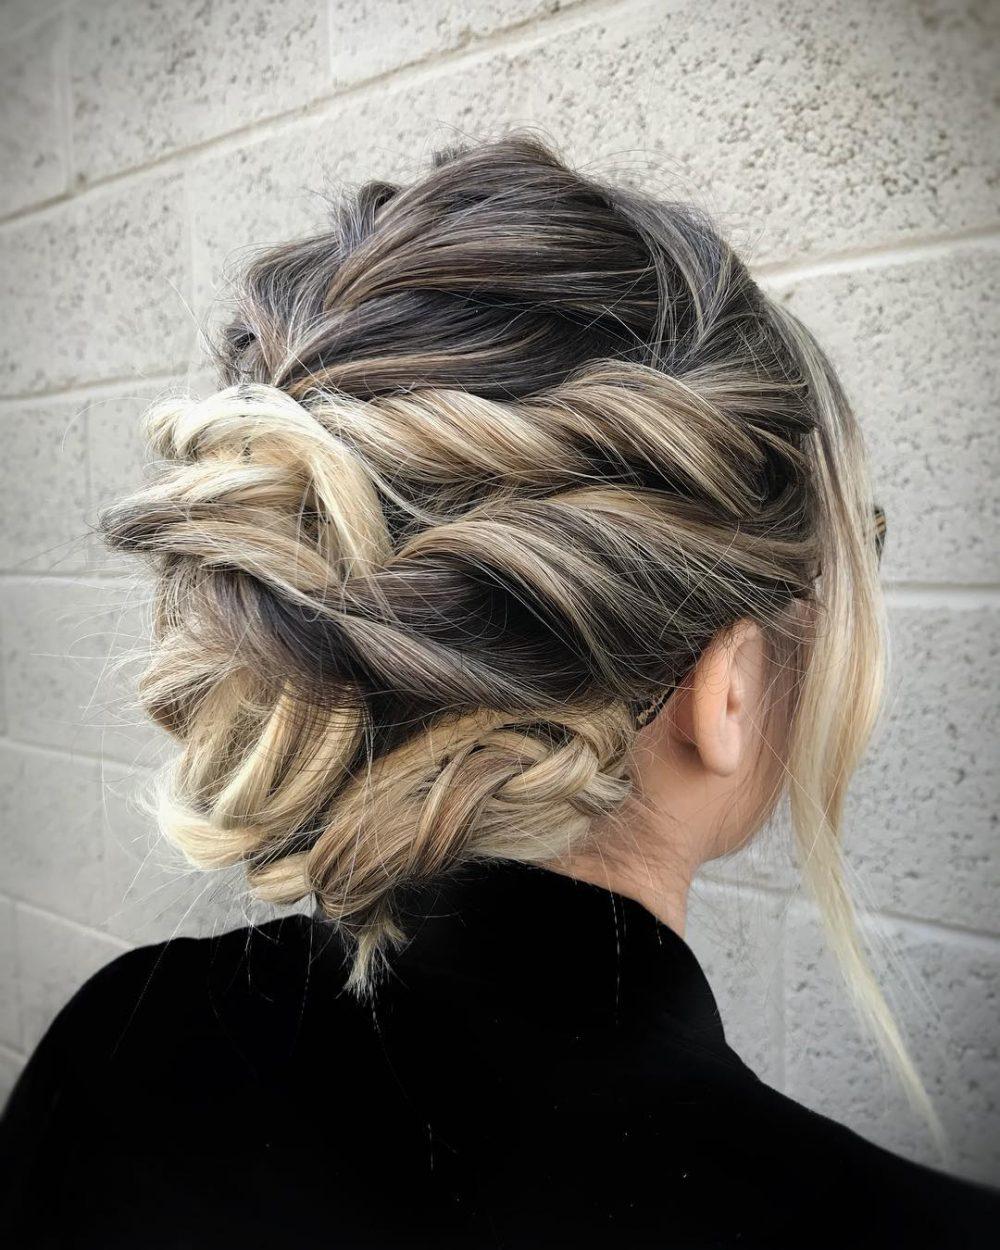 Modern Boho hairstyle